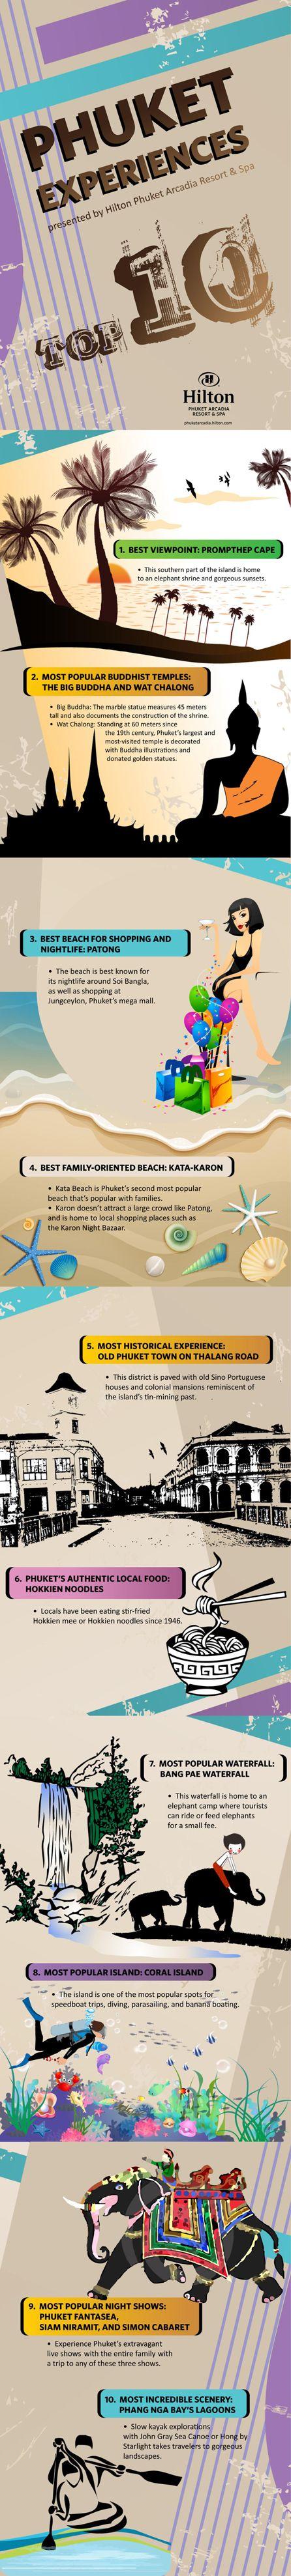 Hilton Phuket Arcadia Resort & Spa Showcases The Best Of Phuket With New Infographic     #travel #infographic